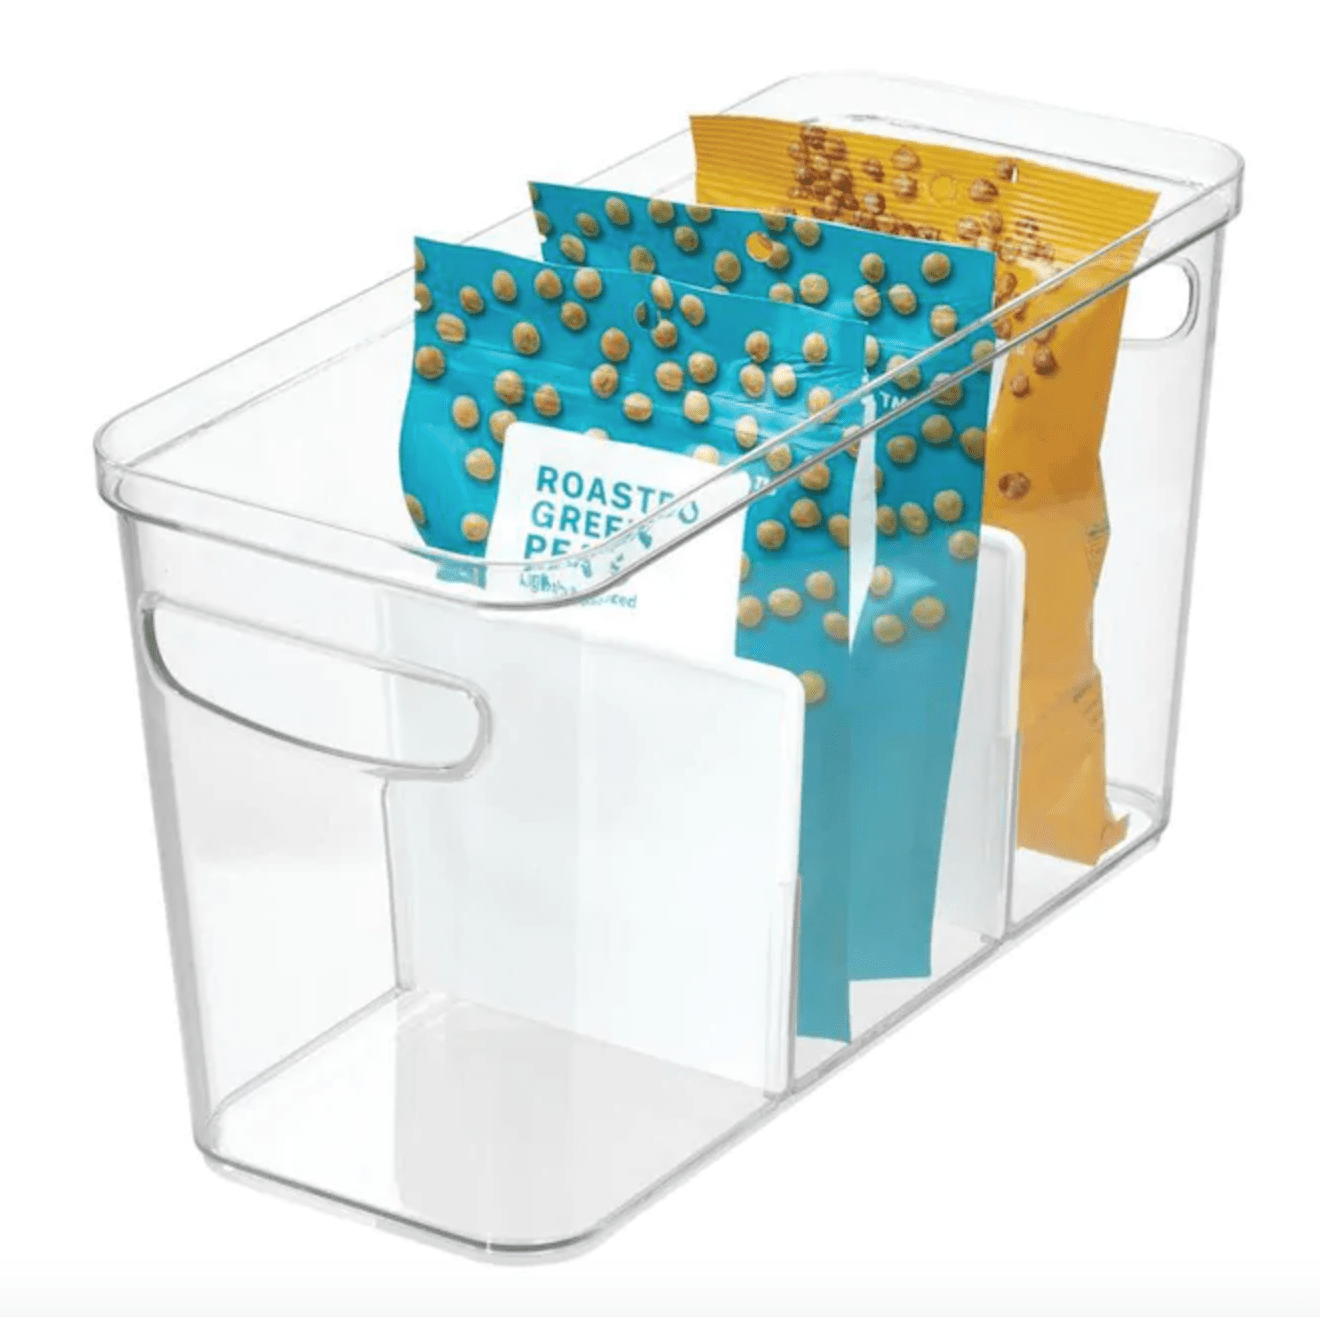 14-in x 6-in Plastic Multi-use Insert Drawer Organizer